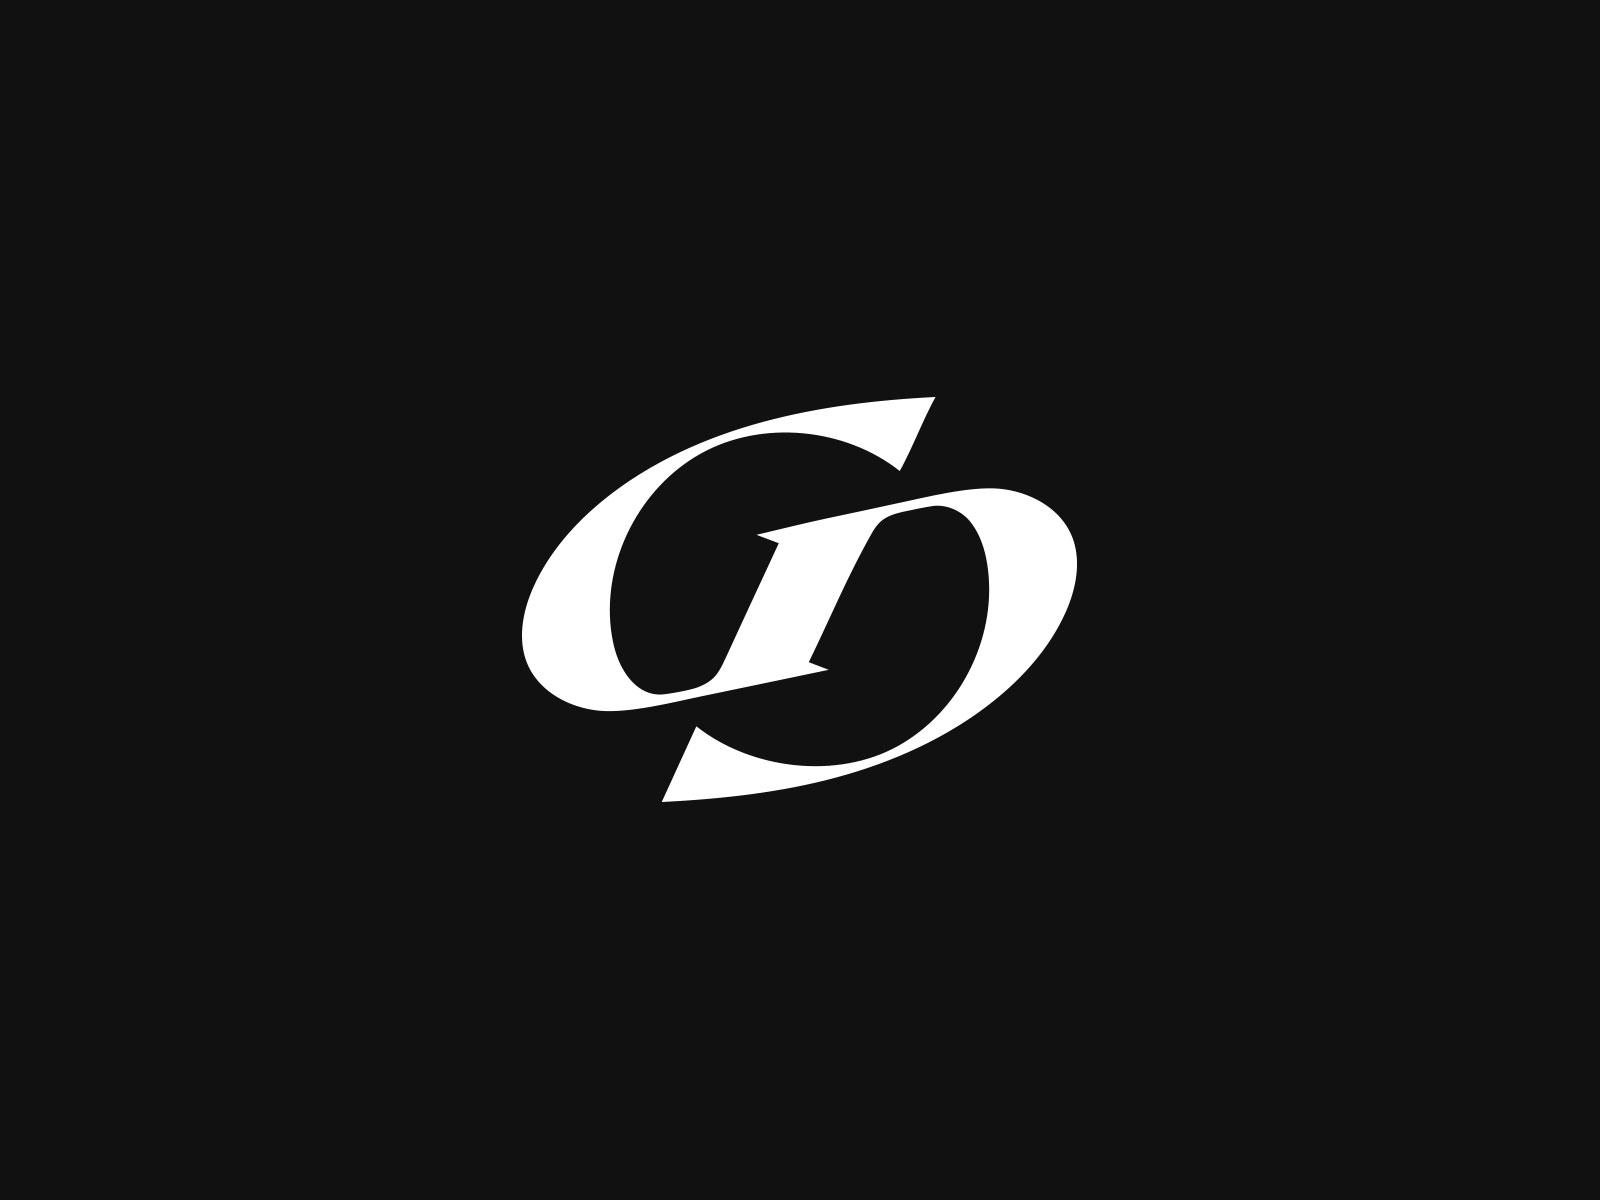 Personal Logo - Christian Dakota